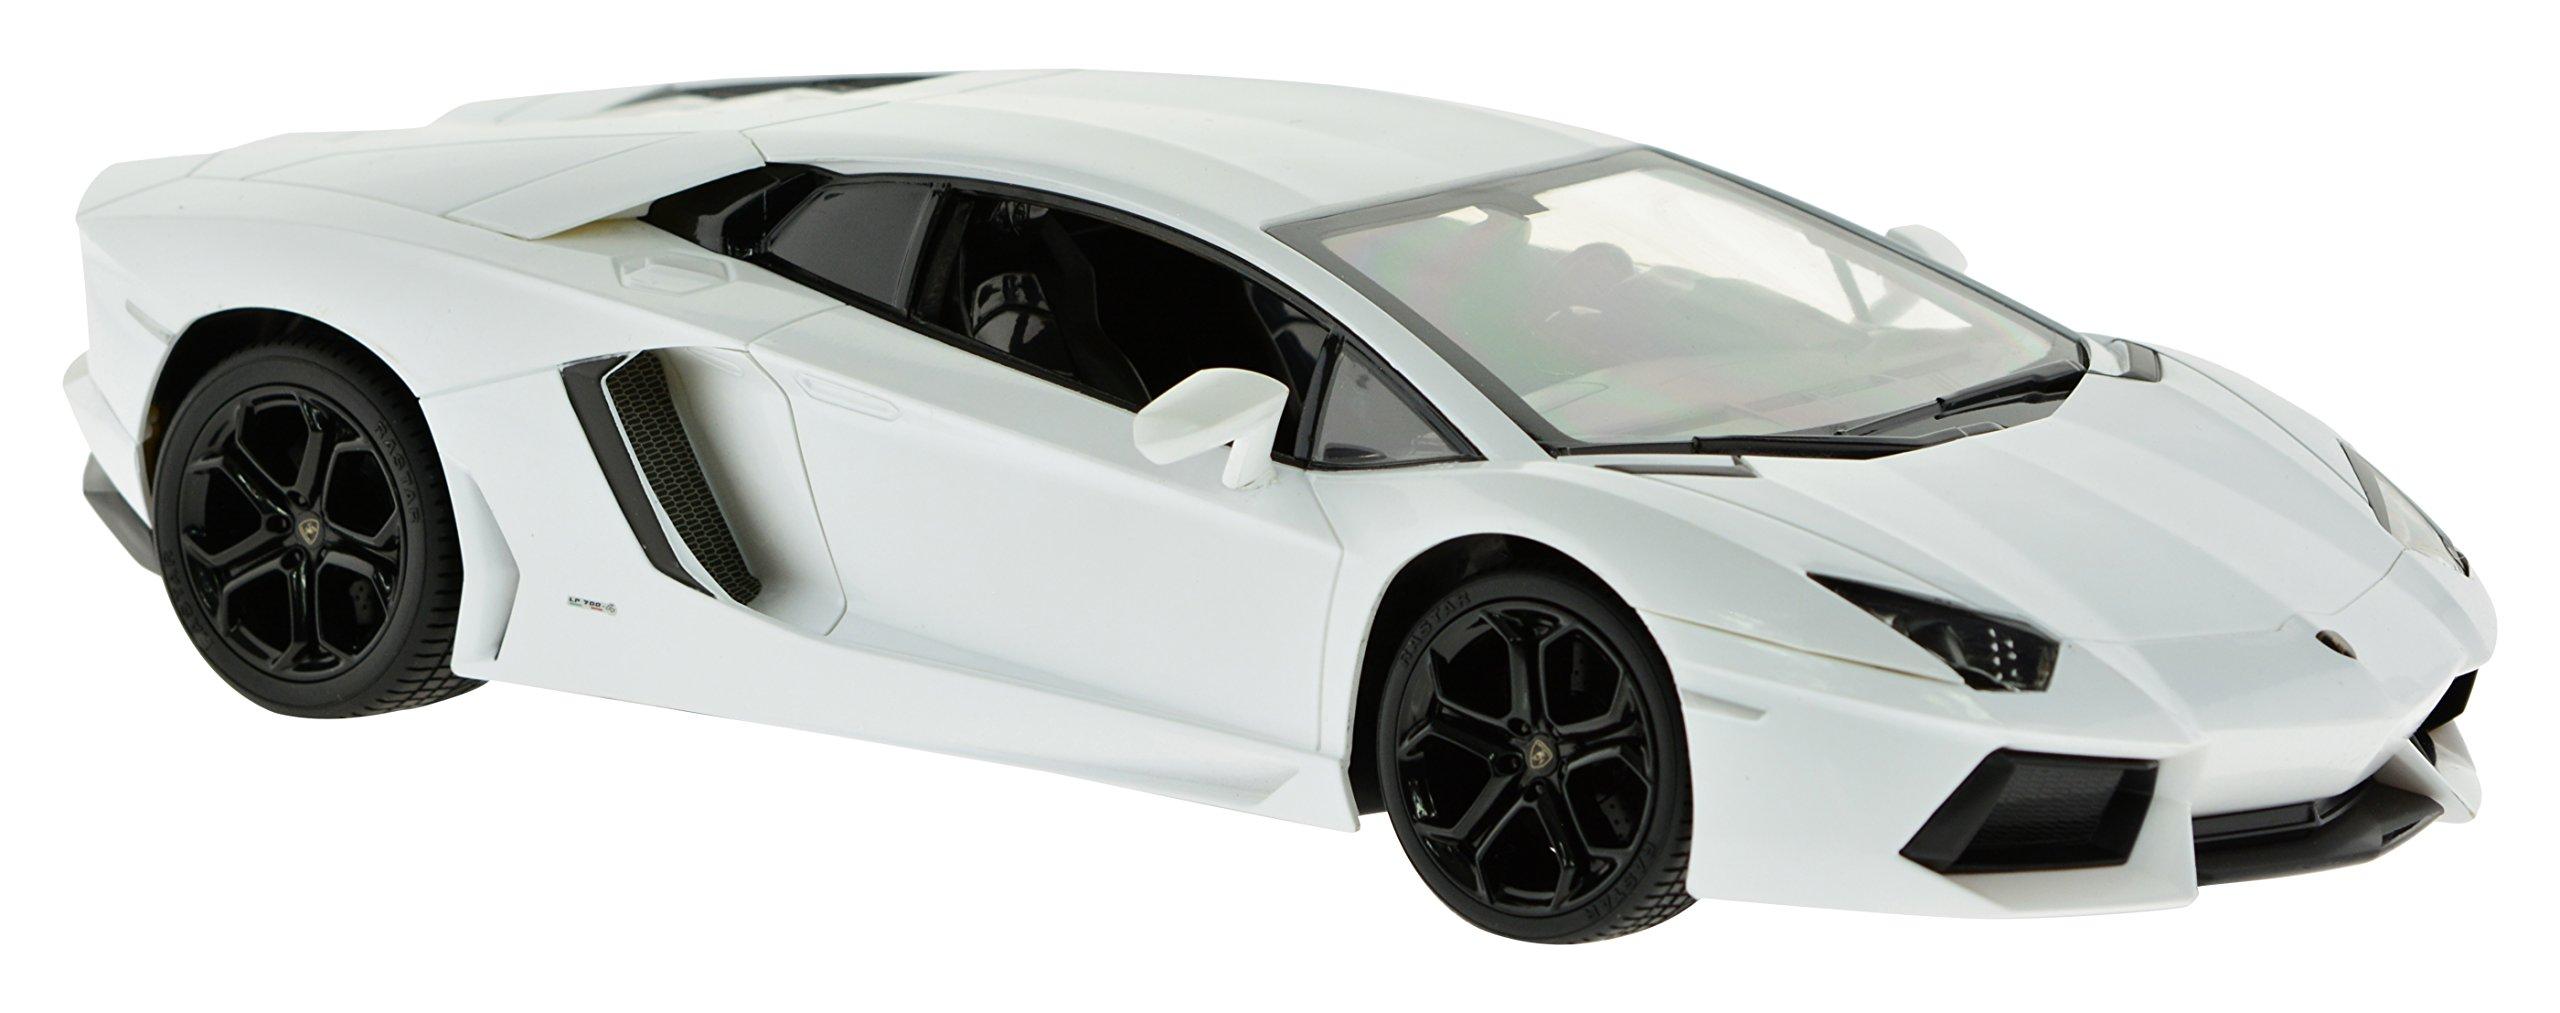 Carmel 1:14 Lamborghini Aventador Lp700 2.4Ghz with Lights Rechargeable Battery, White by Carmel